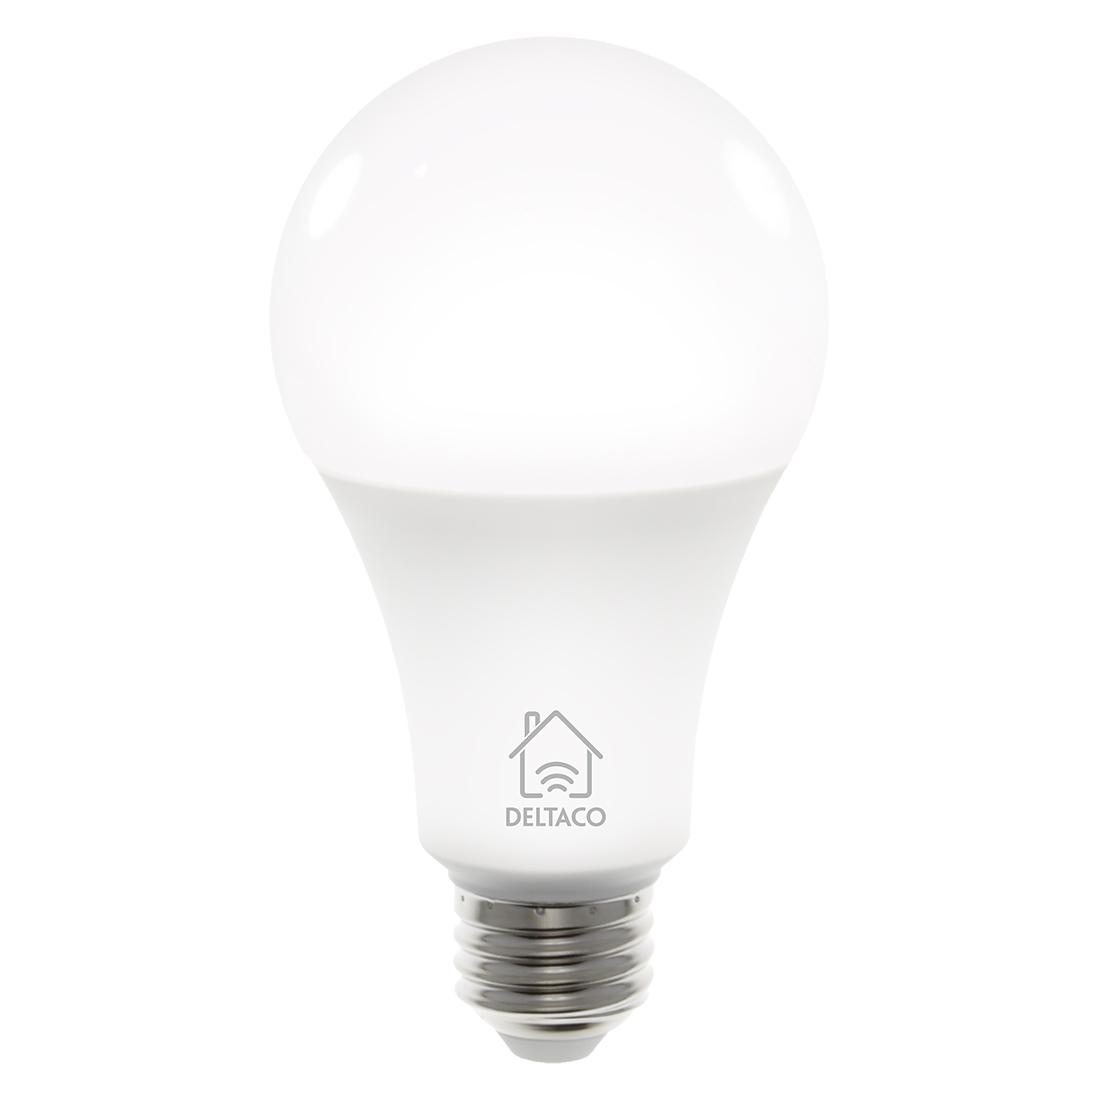 Deltaco Smart Home LED-lampa, E27, WiFi, 9W, 2700K-6500K, dimbar